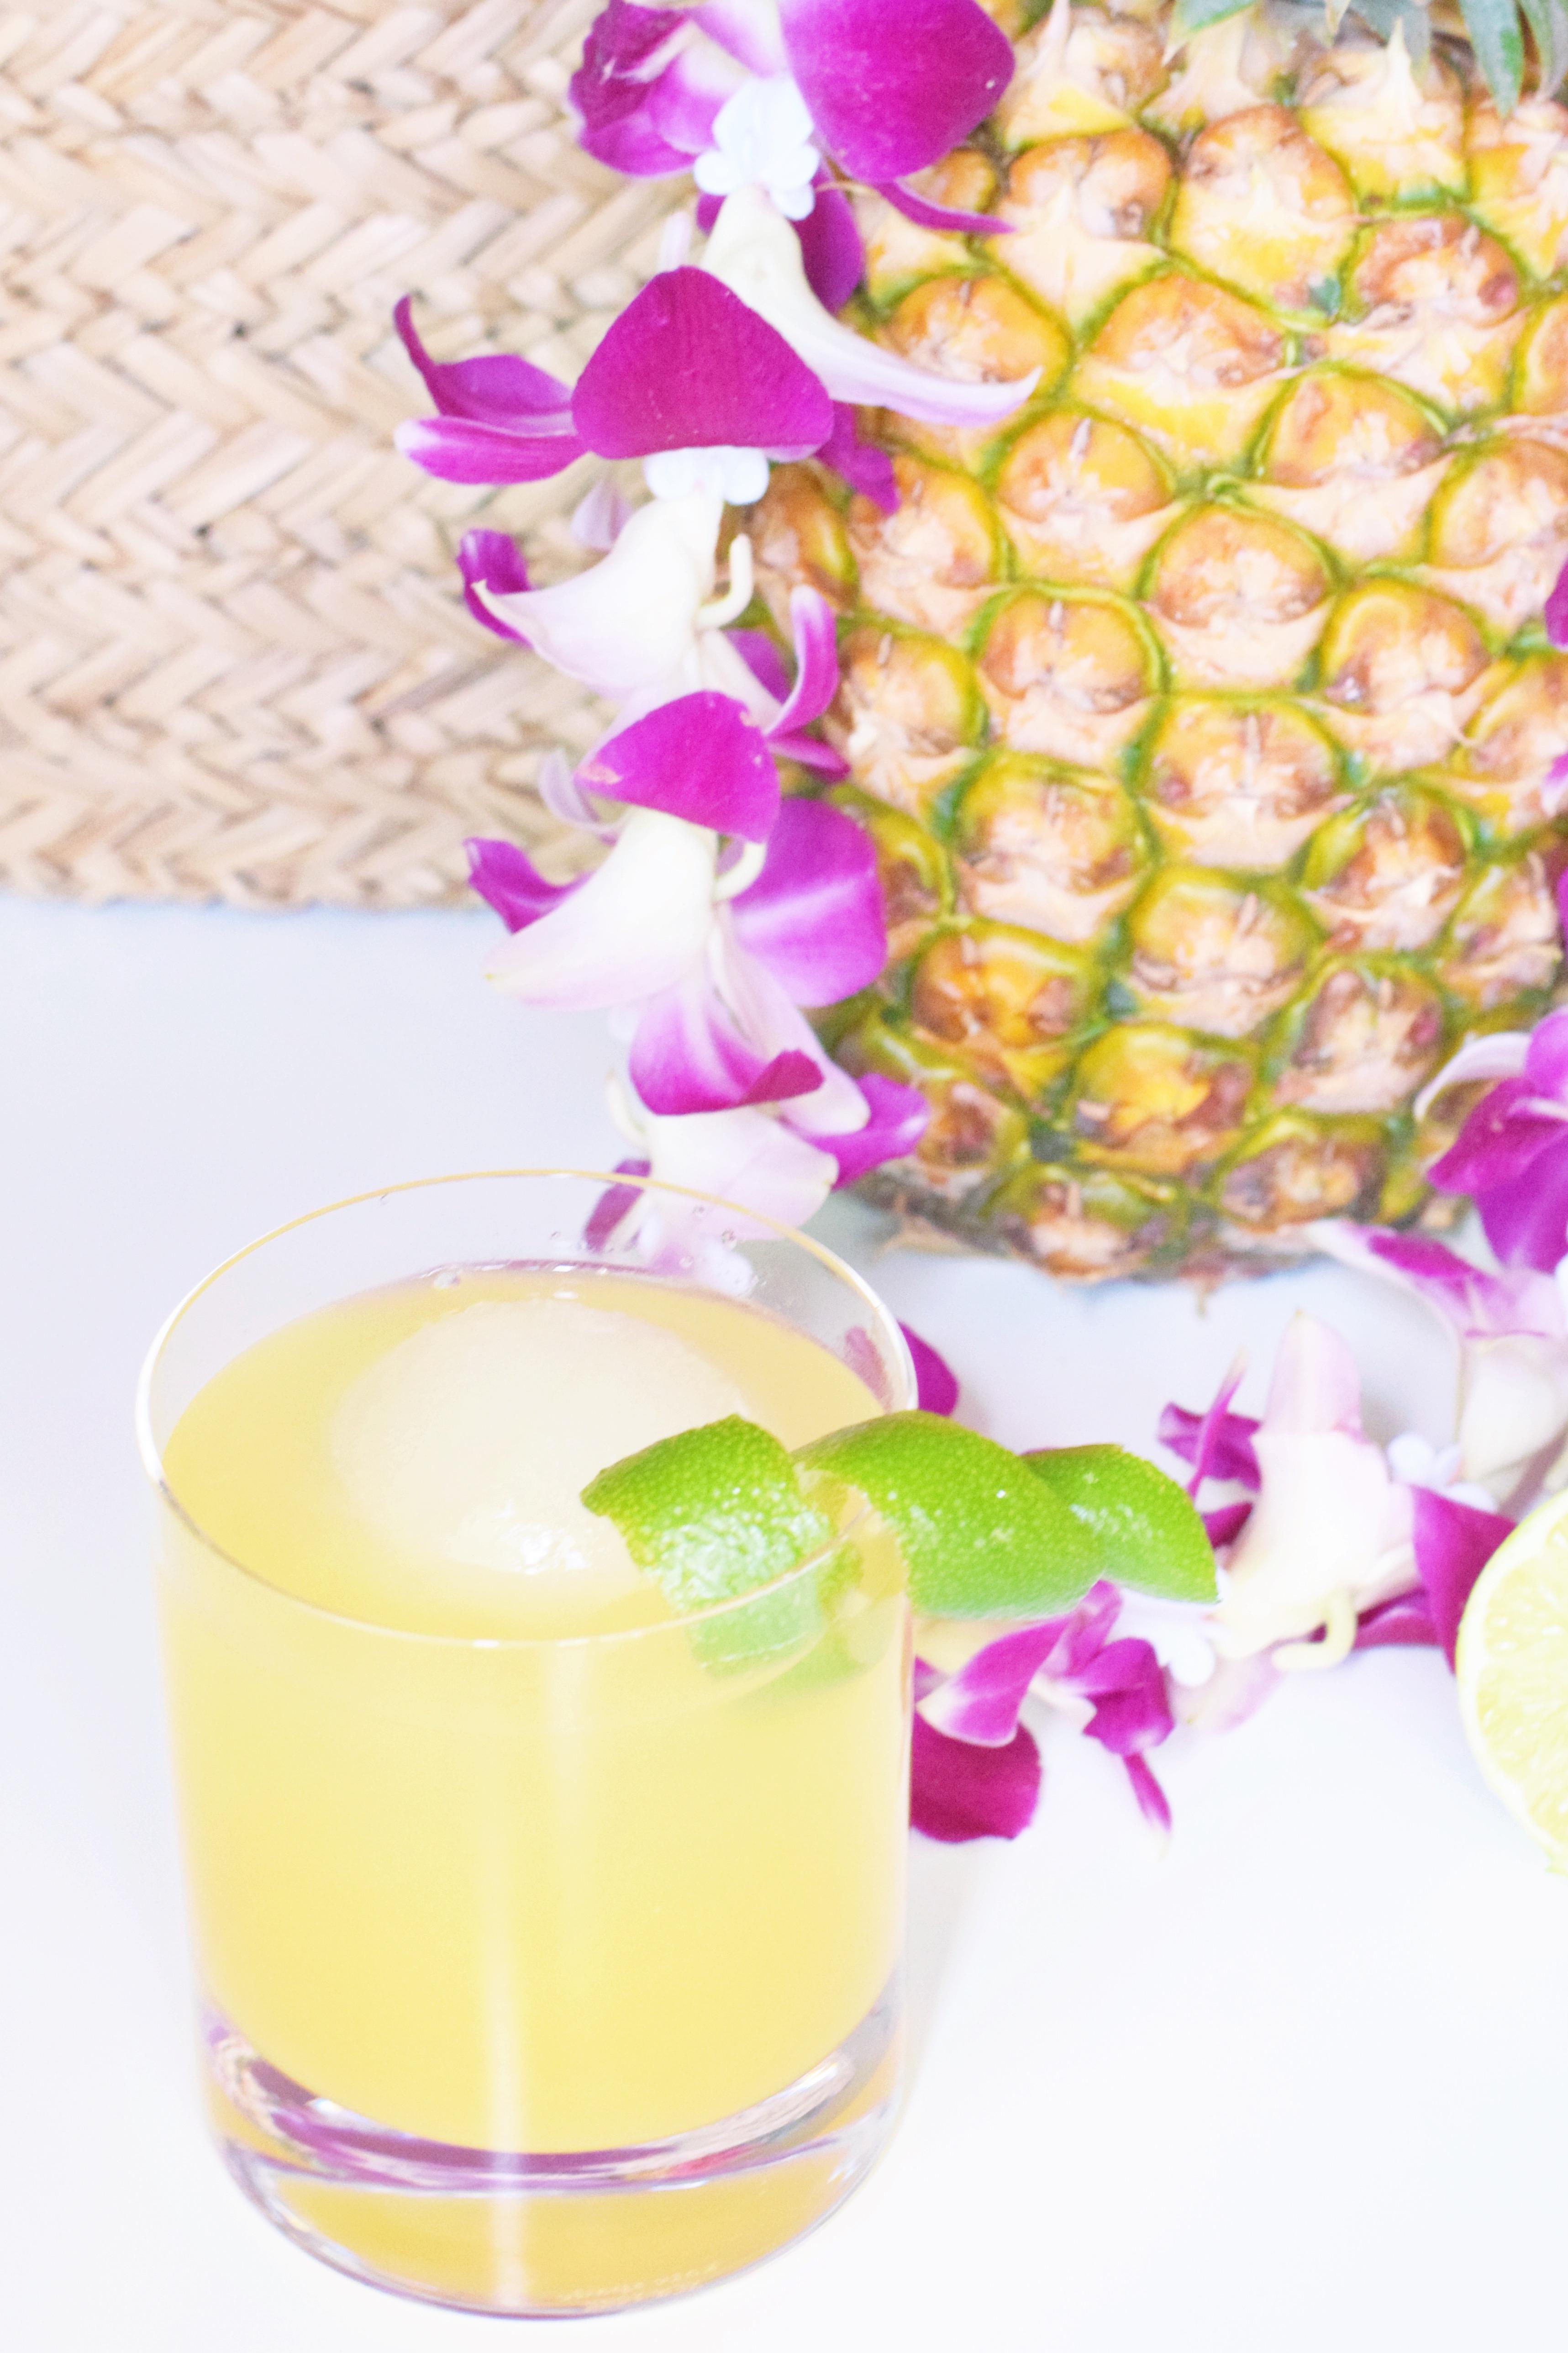 Pineapple Poolboy Summer Cocktail - Summer cocktail recipe - Easy Cocktail - Pineapple Cocktail - 7UP Cocktail - Cocktail Recipe For Summer Party - Girly Cocktail - Citrus Cocktail - Alcoholic Beverage - Refreshing Summer Cocktail Recipe - Communikait by Kait Hanson